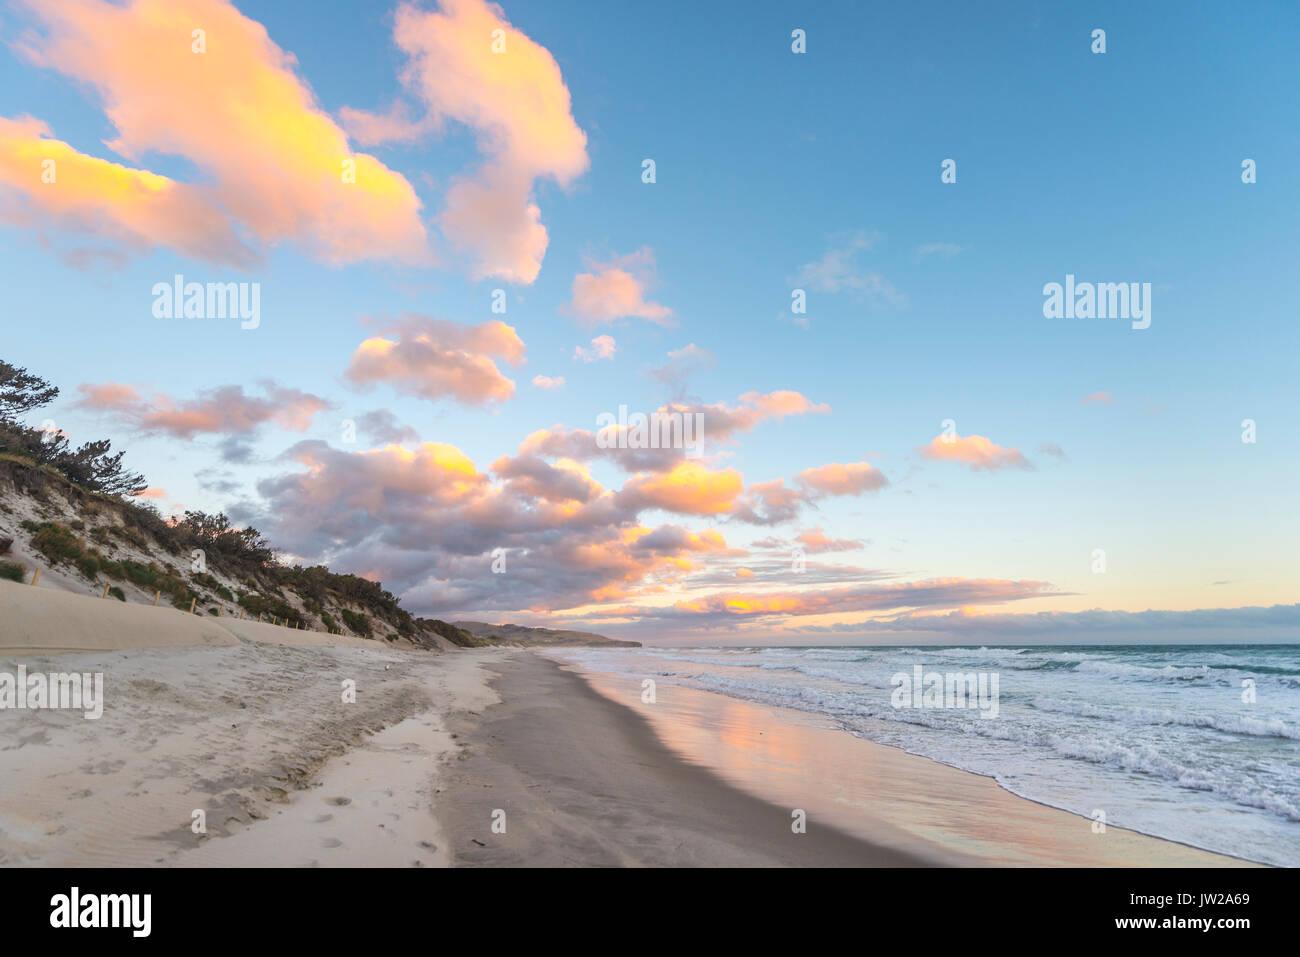 St. Clairs Beach, sunset on the beach, Otago, South Island, New Zealand - Stock Image